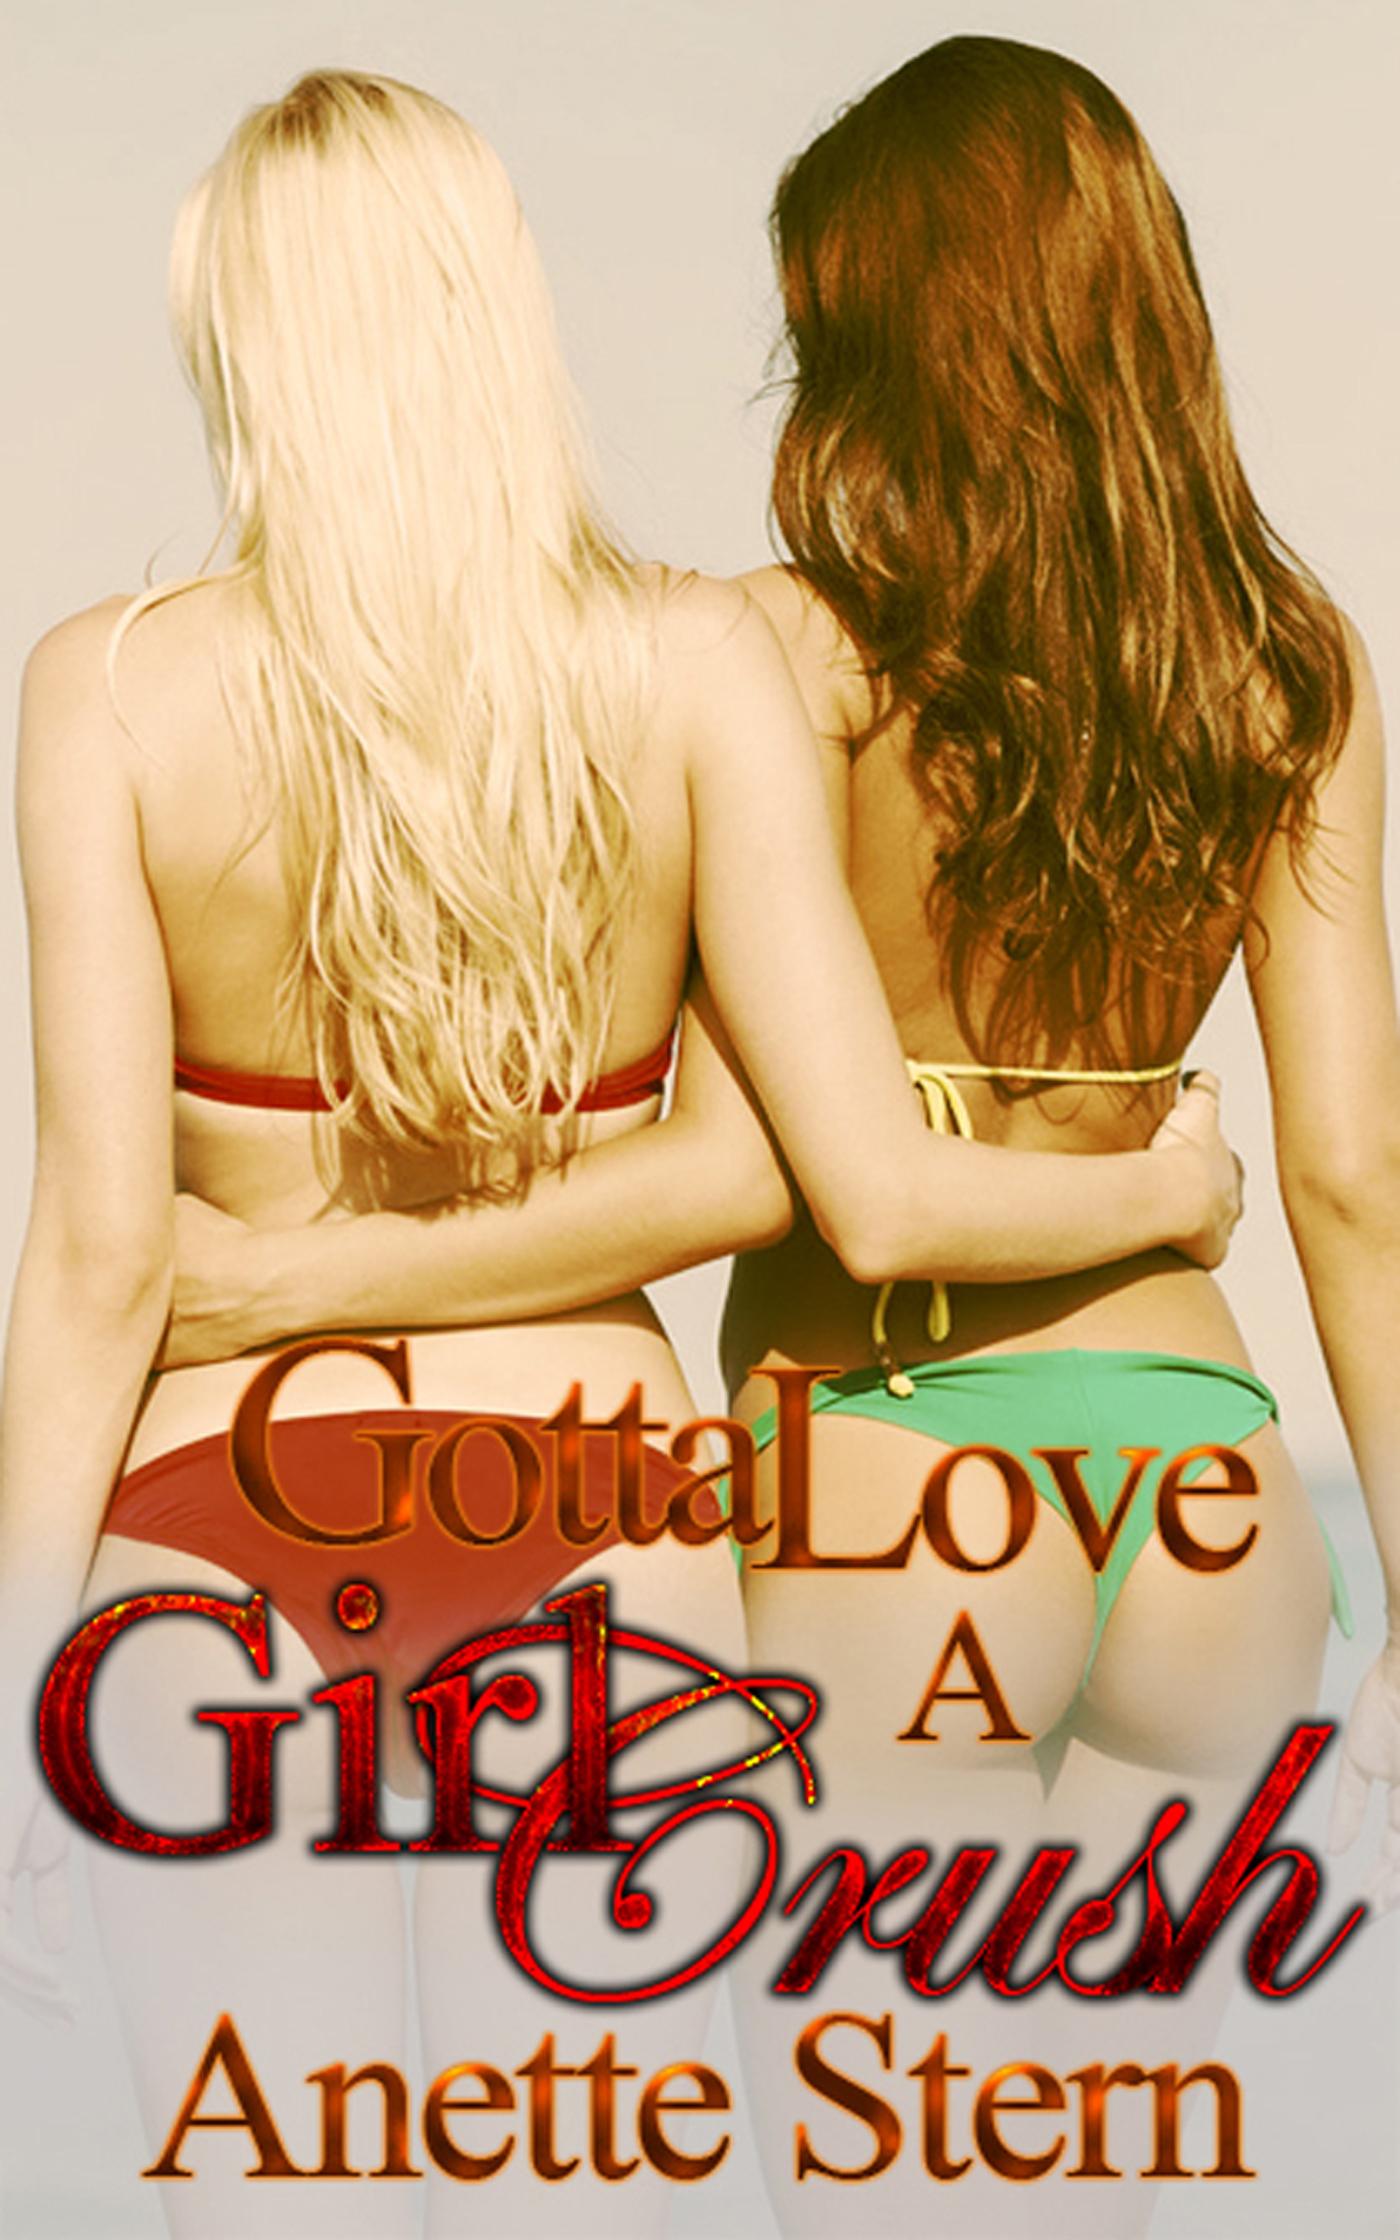 Gotta Love A Girl Crush  by  Anette Stern